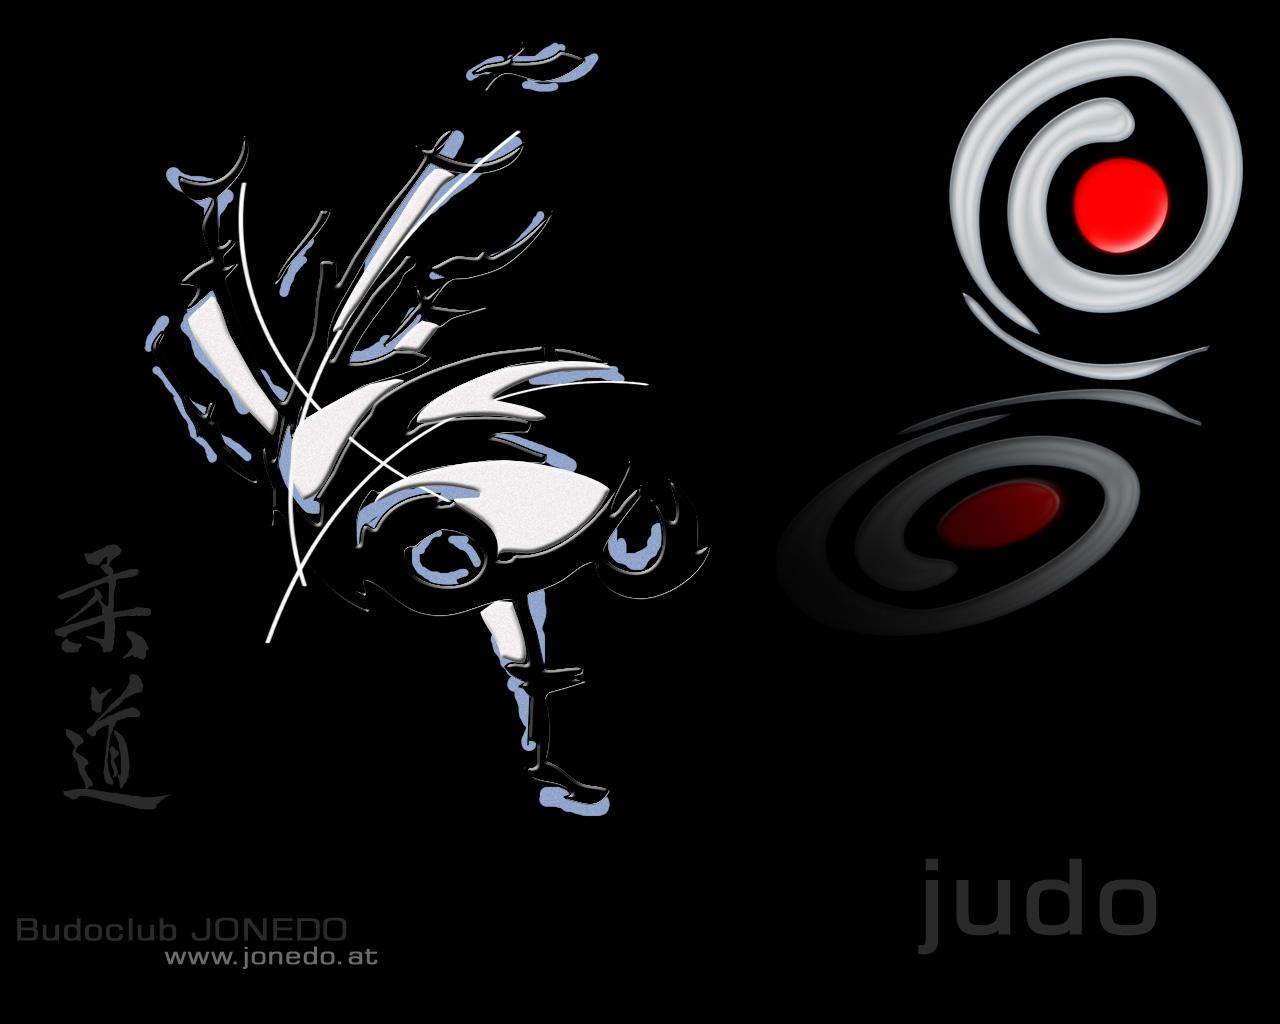 Judo Wallpaper Desktop   Viewing Gallery 1280x1024